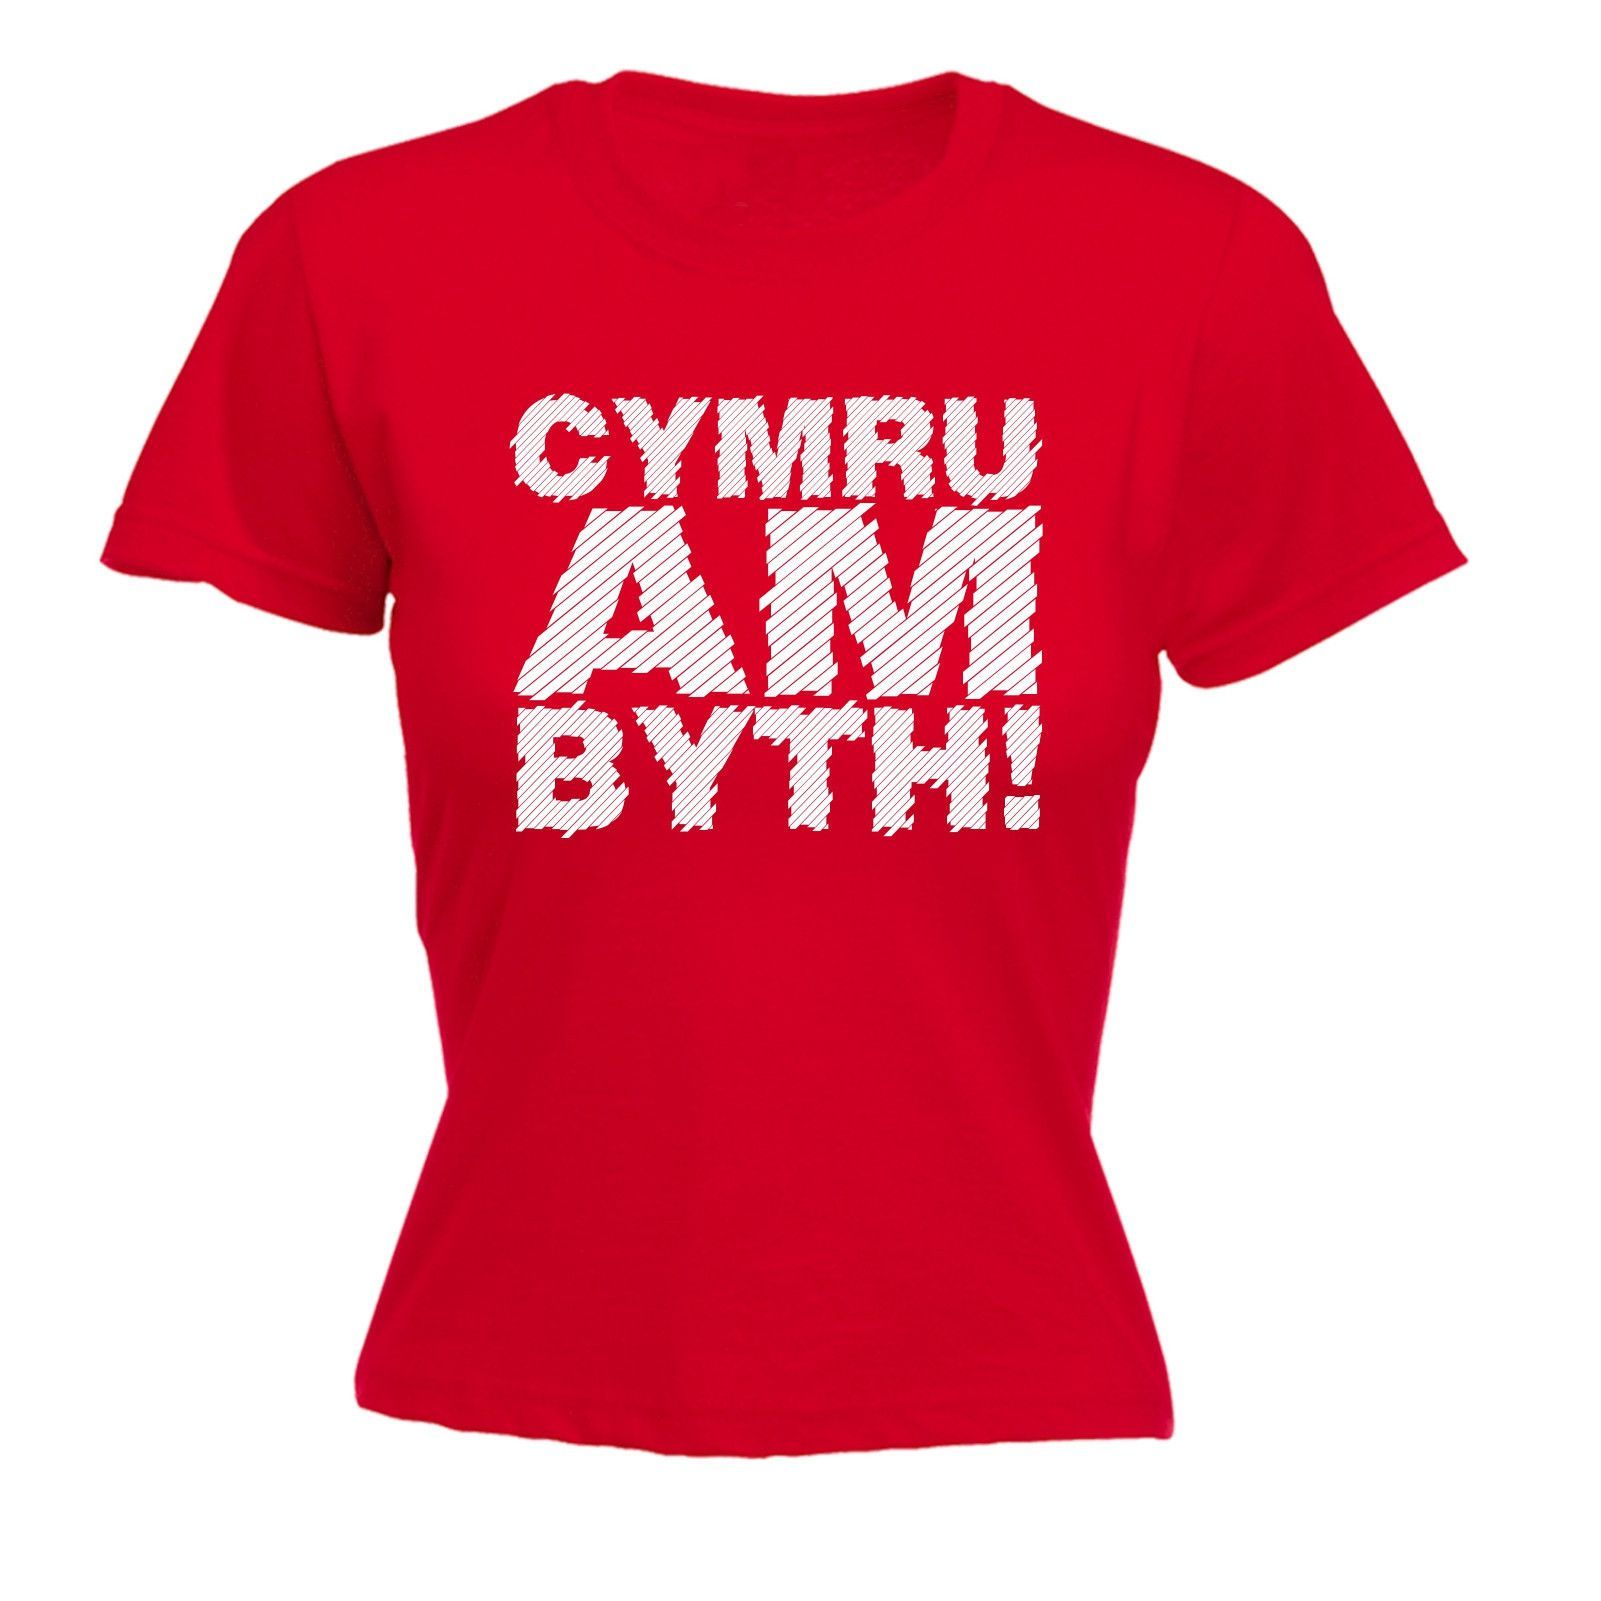 123t USA Women's Cymru Am Byth Funny T-Shirt